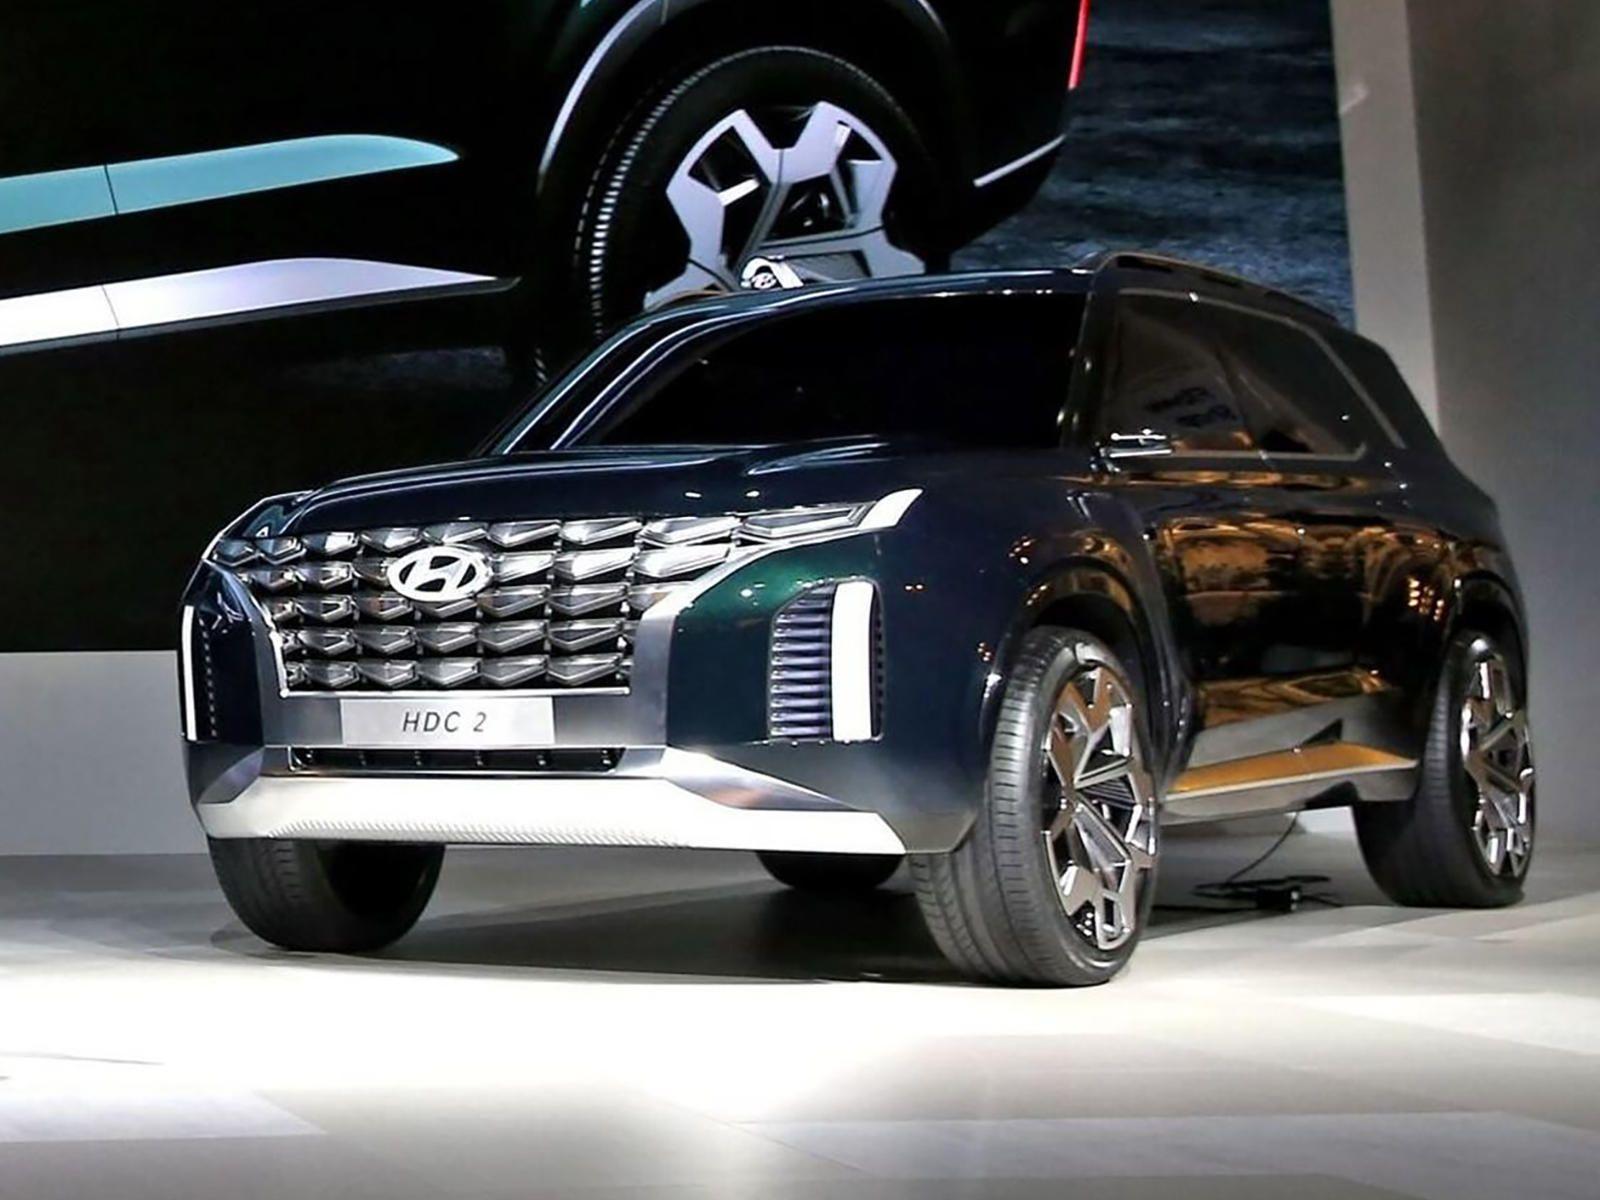 Is Hyundai Preparing A Rugged Suv To Rival The Toyota Land Cruiser Hyundai Tucson New Upcoming Cars Hyundai